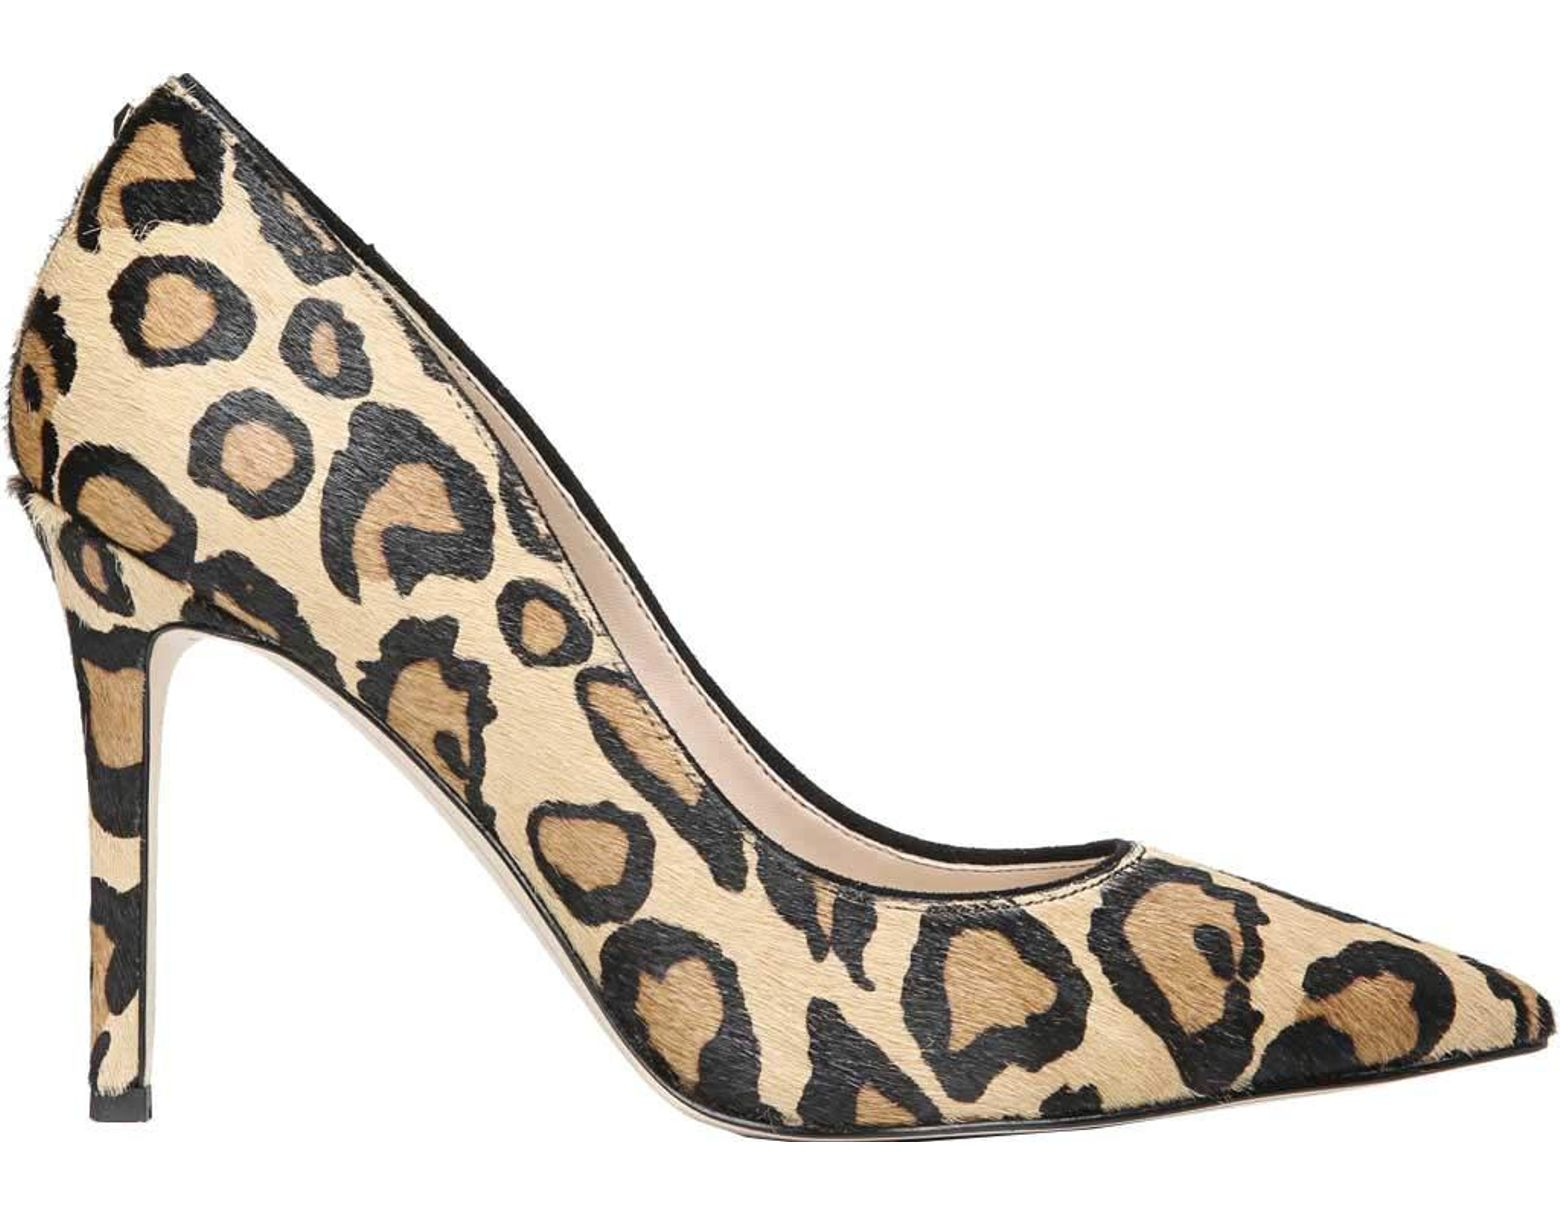 3d1c06b35 Lyst - Sam Edelman Hazel Pointed Toe Stiletto Heel Pump in Natural ...